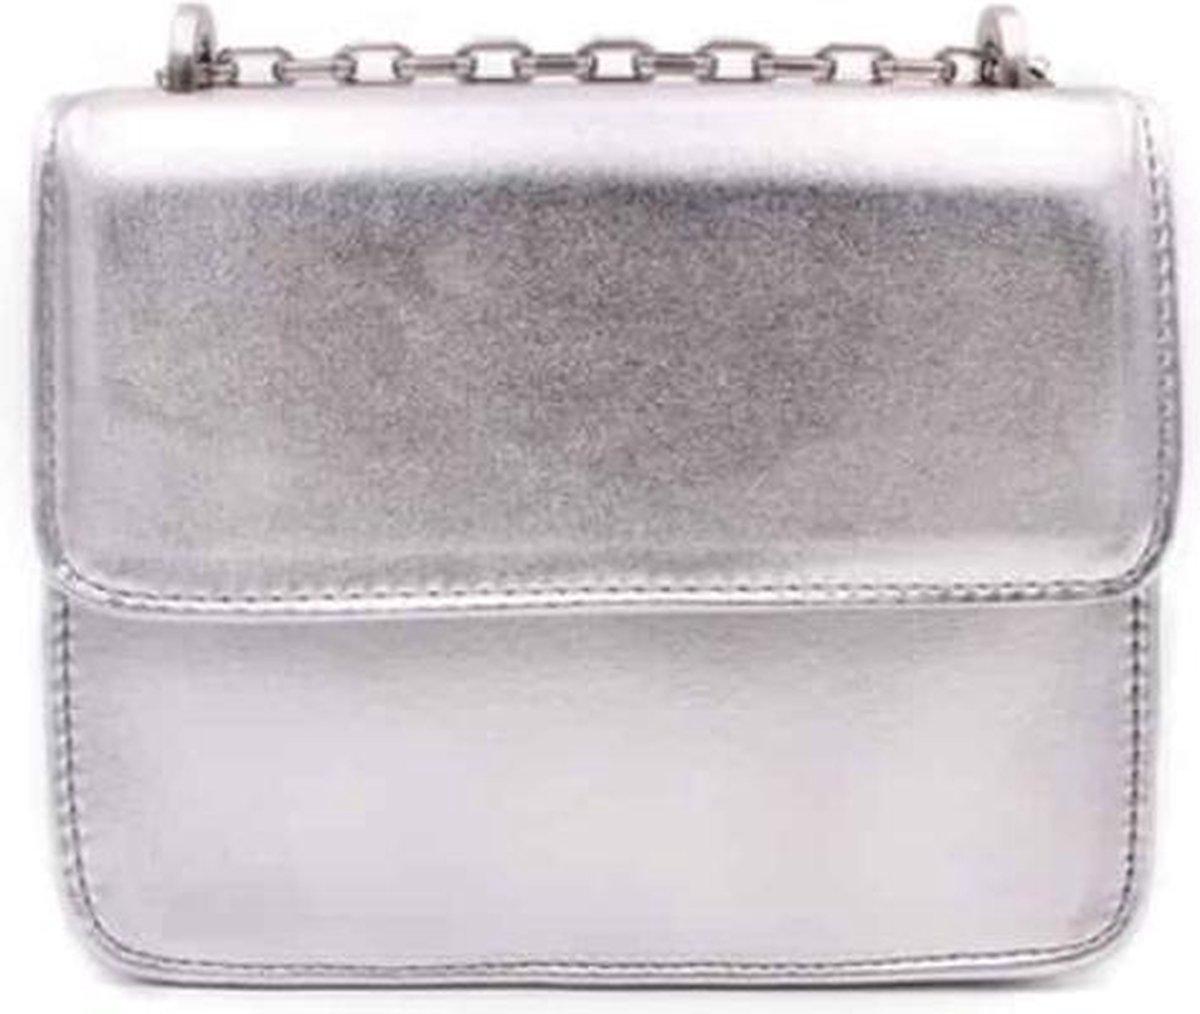 Denise Roobol - Mini Cruise Bag Silver - Schoudertas - Crossbody Bag